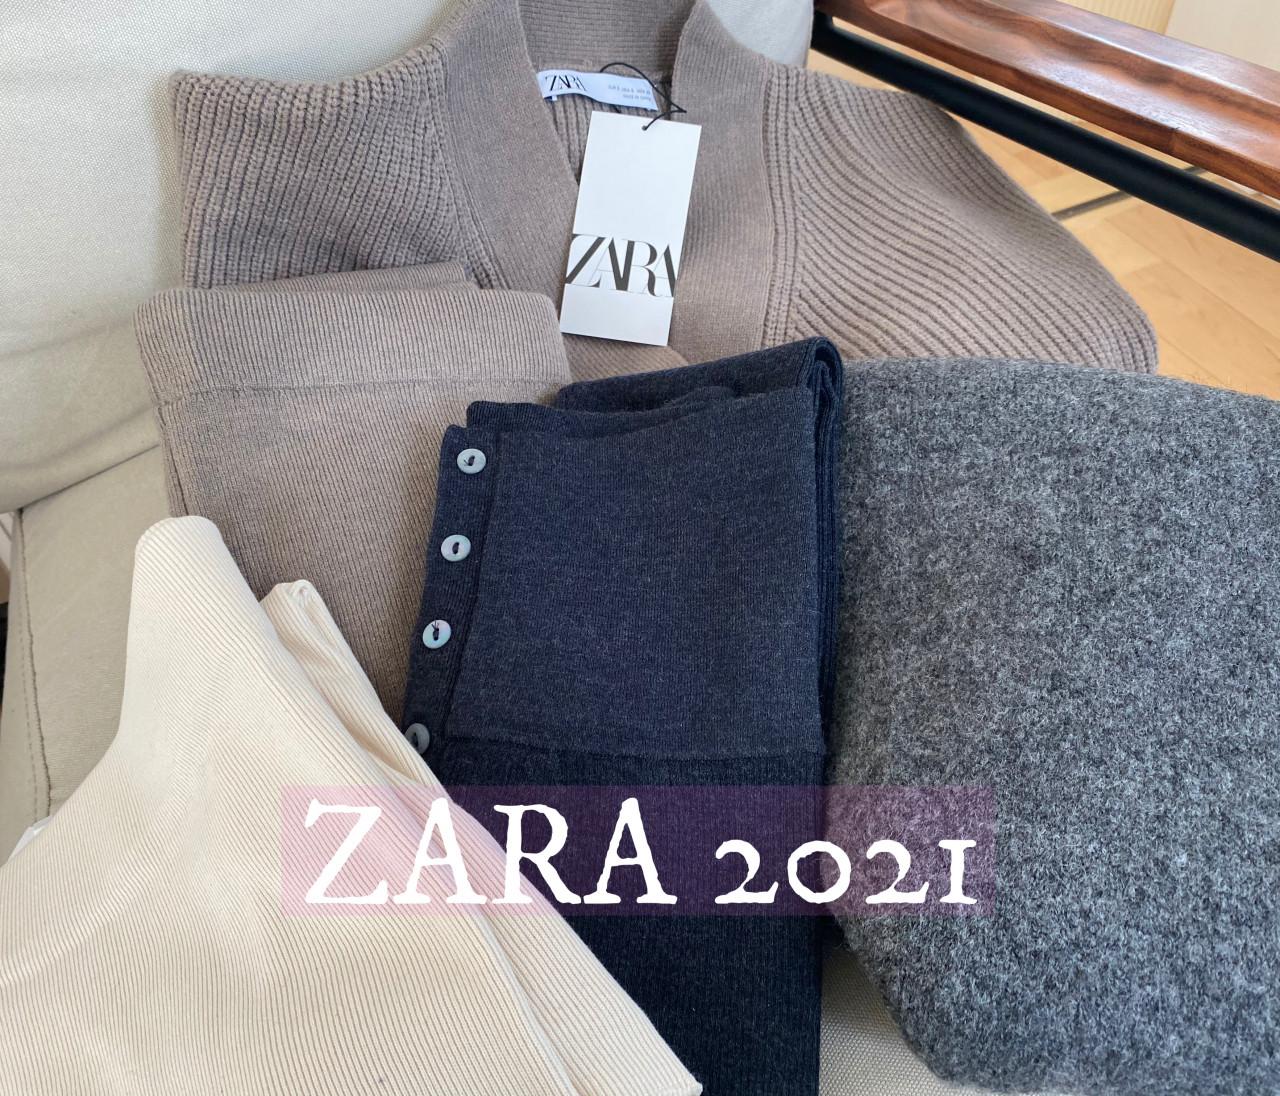 【ZARA新作】家の外でも中でも着れちゃうゆるっとスタイル